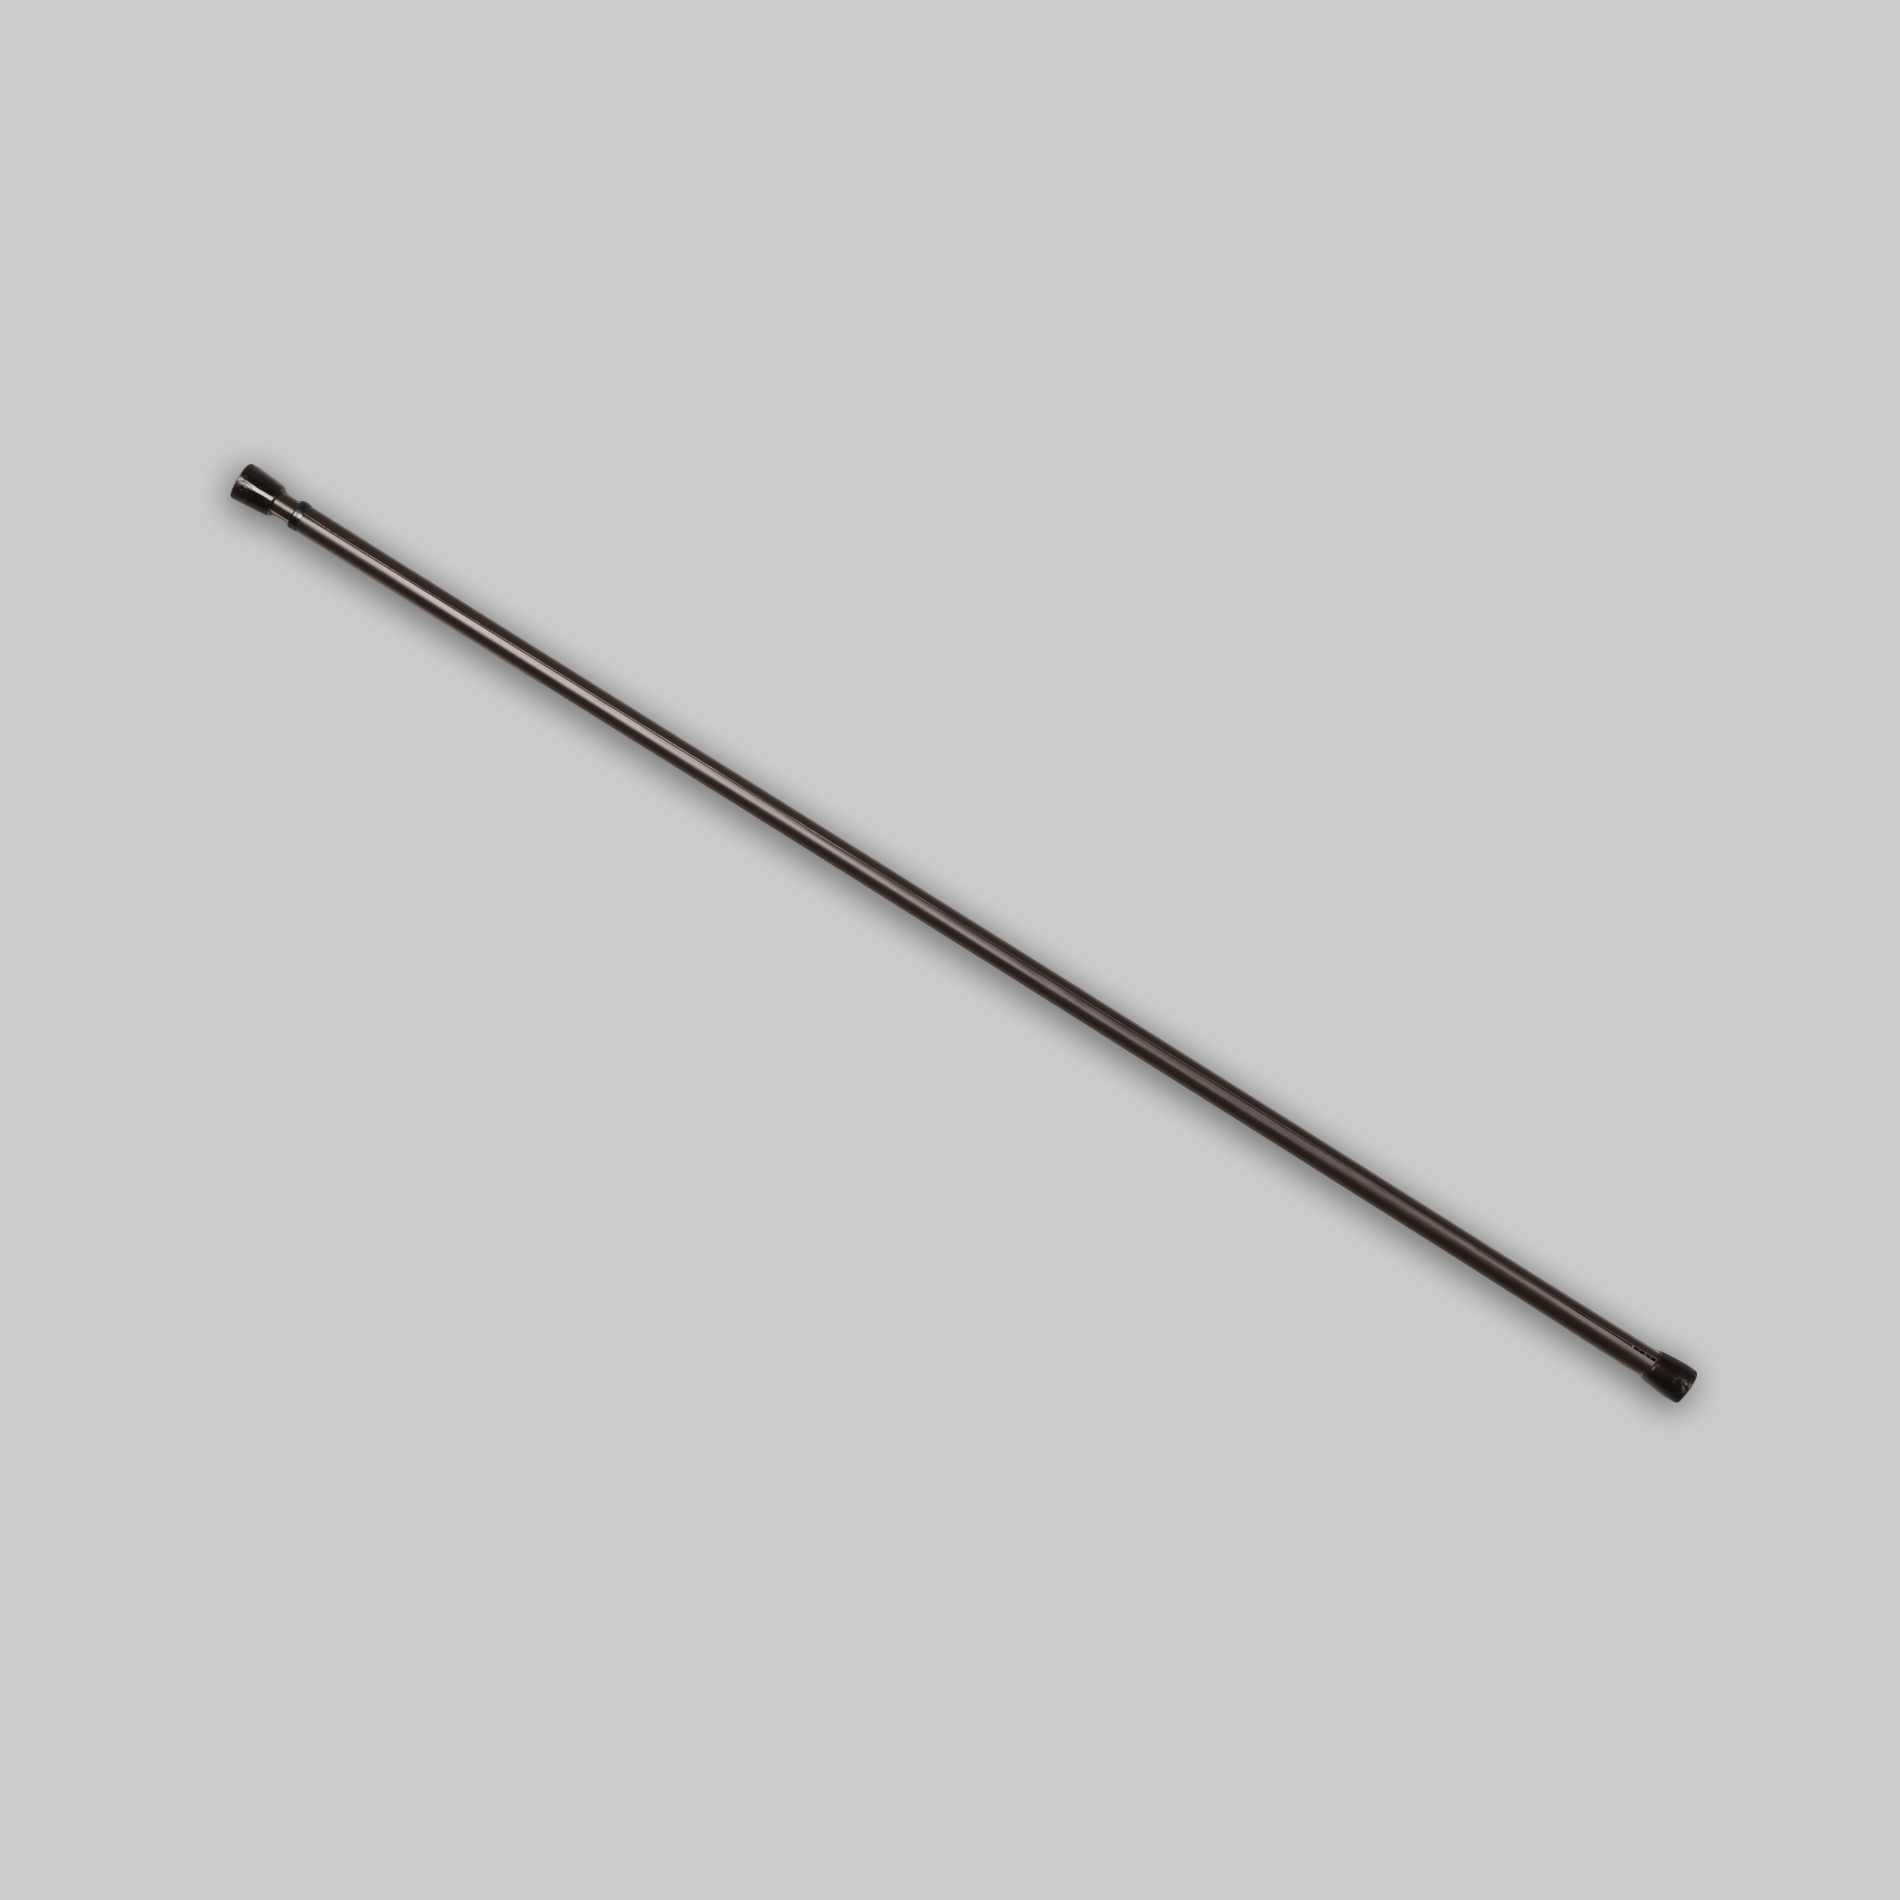 Image of Bali Round Spring Tension Spring Rod - Bronze